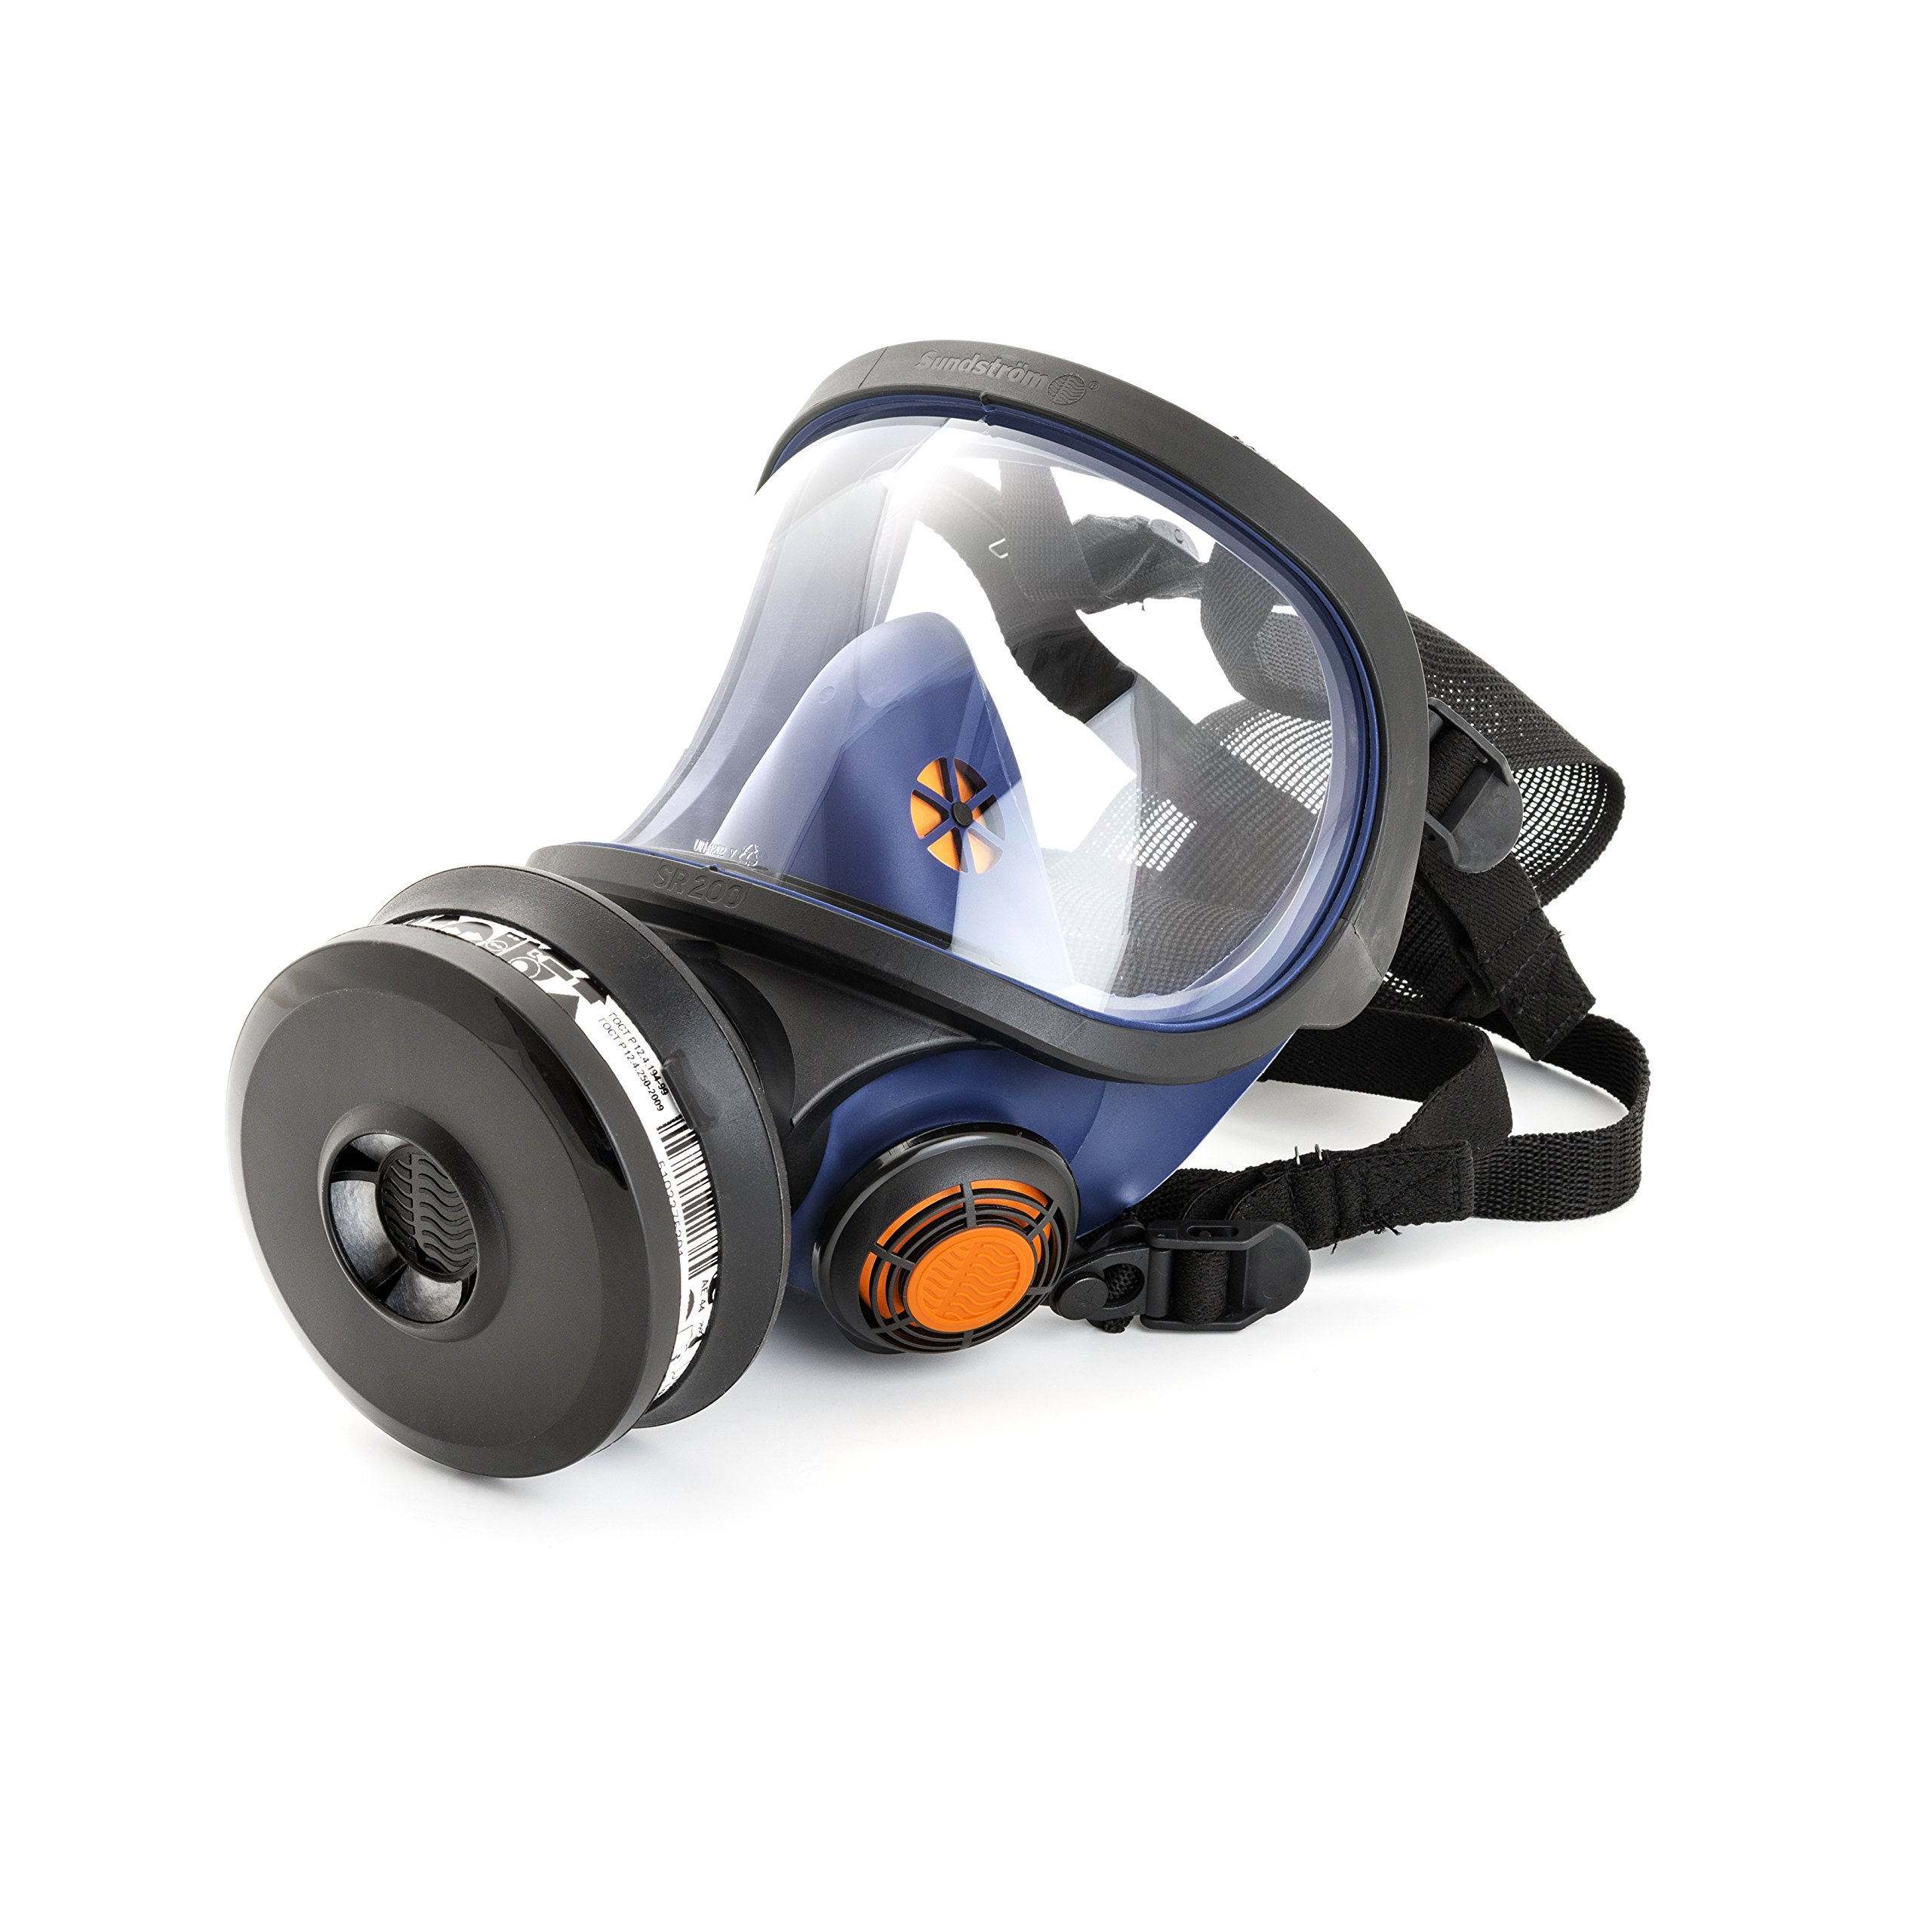 Sundstrom H01-1221 SR 200 Full Face Mask Respirator with PC Visor, Silicone